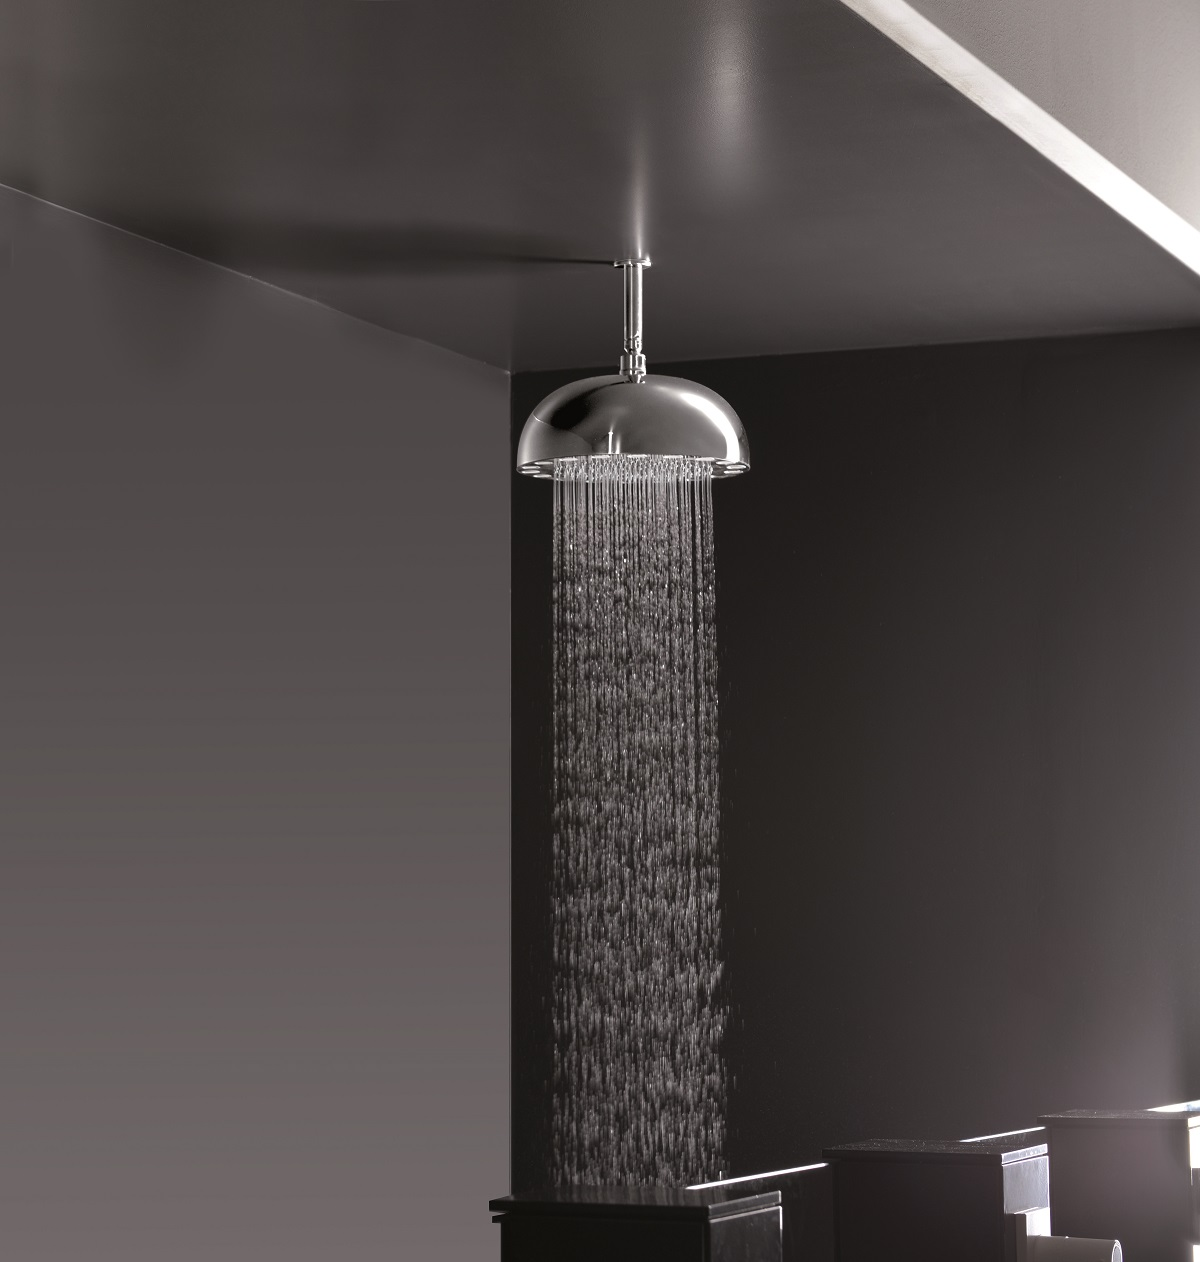 Dynamo Dynamic LED Hydropowered Round Shower Head Chrome 4 web(main)